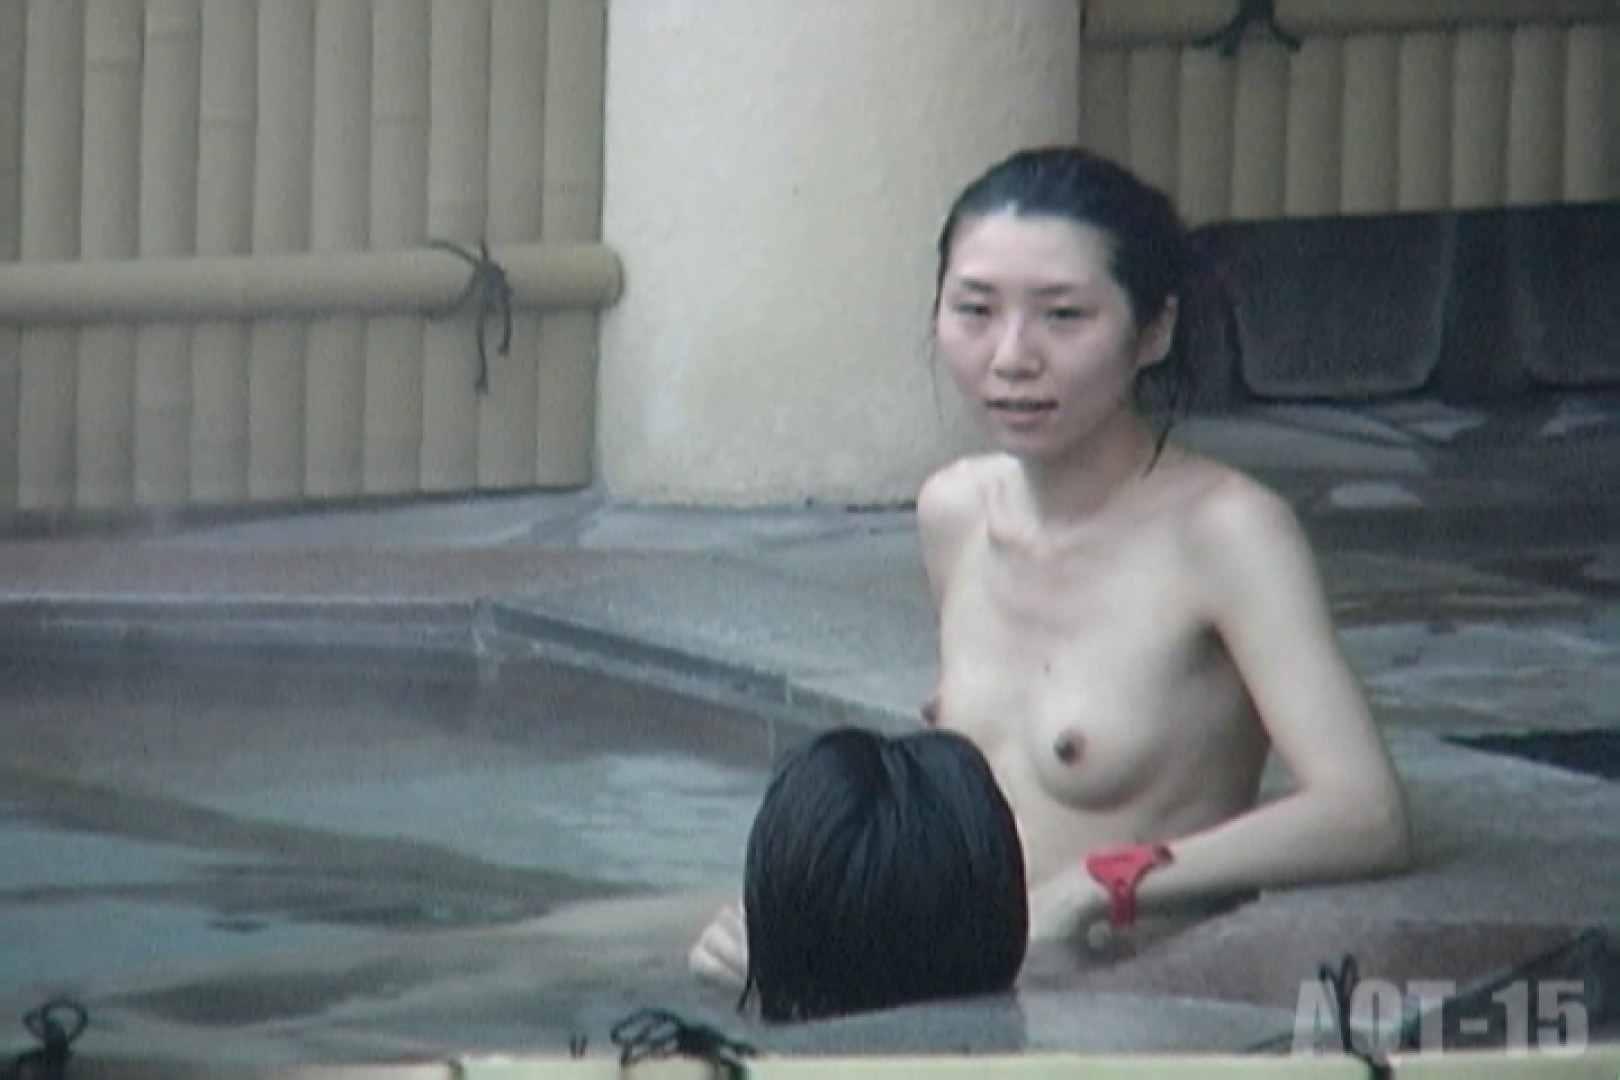 Aquaな露天風呂Vol.837 エッチな盗撮 エロ無料画像 103pic 28